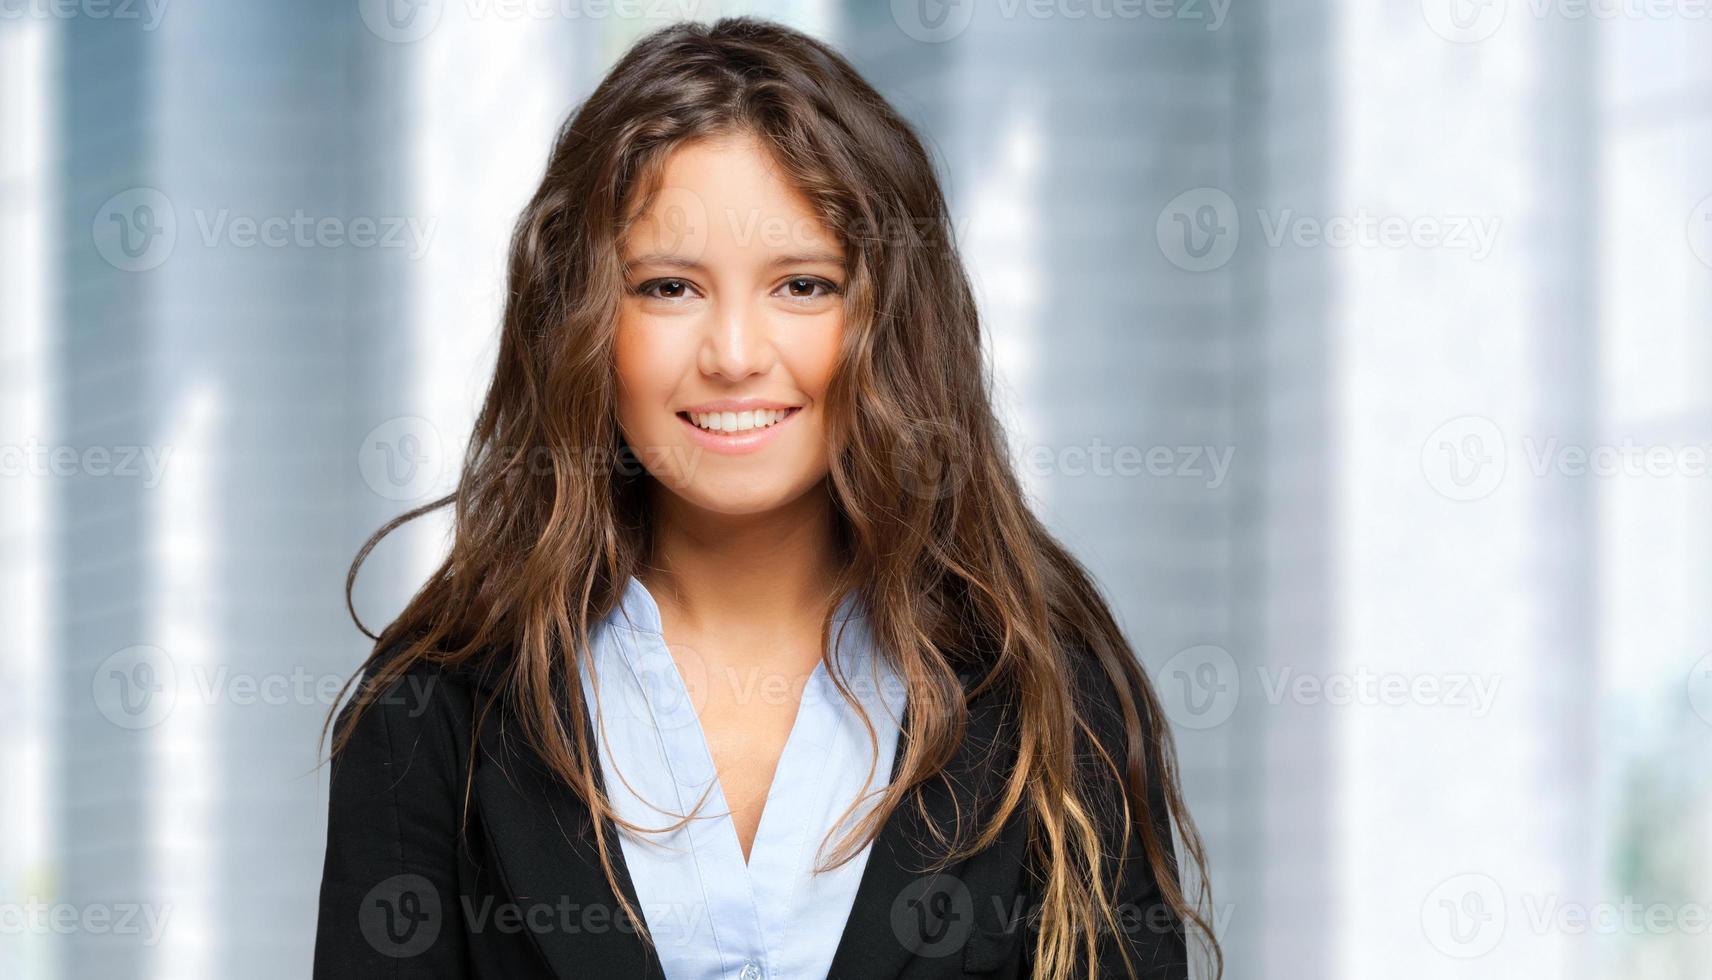 le affärskvinna på ett modernt kontor foto